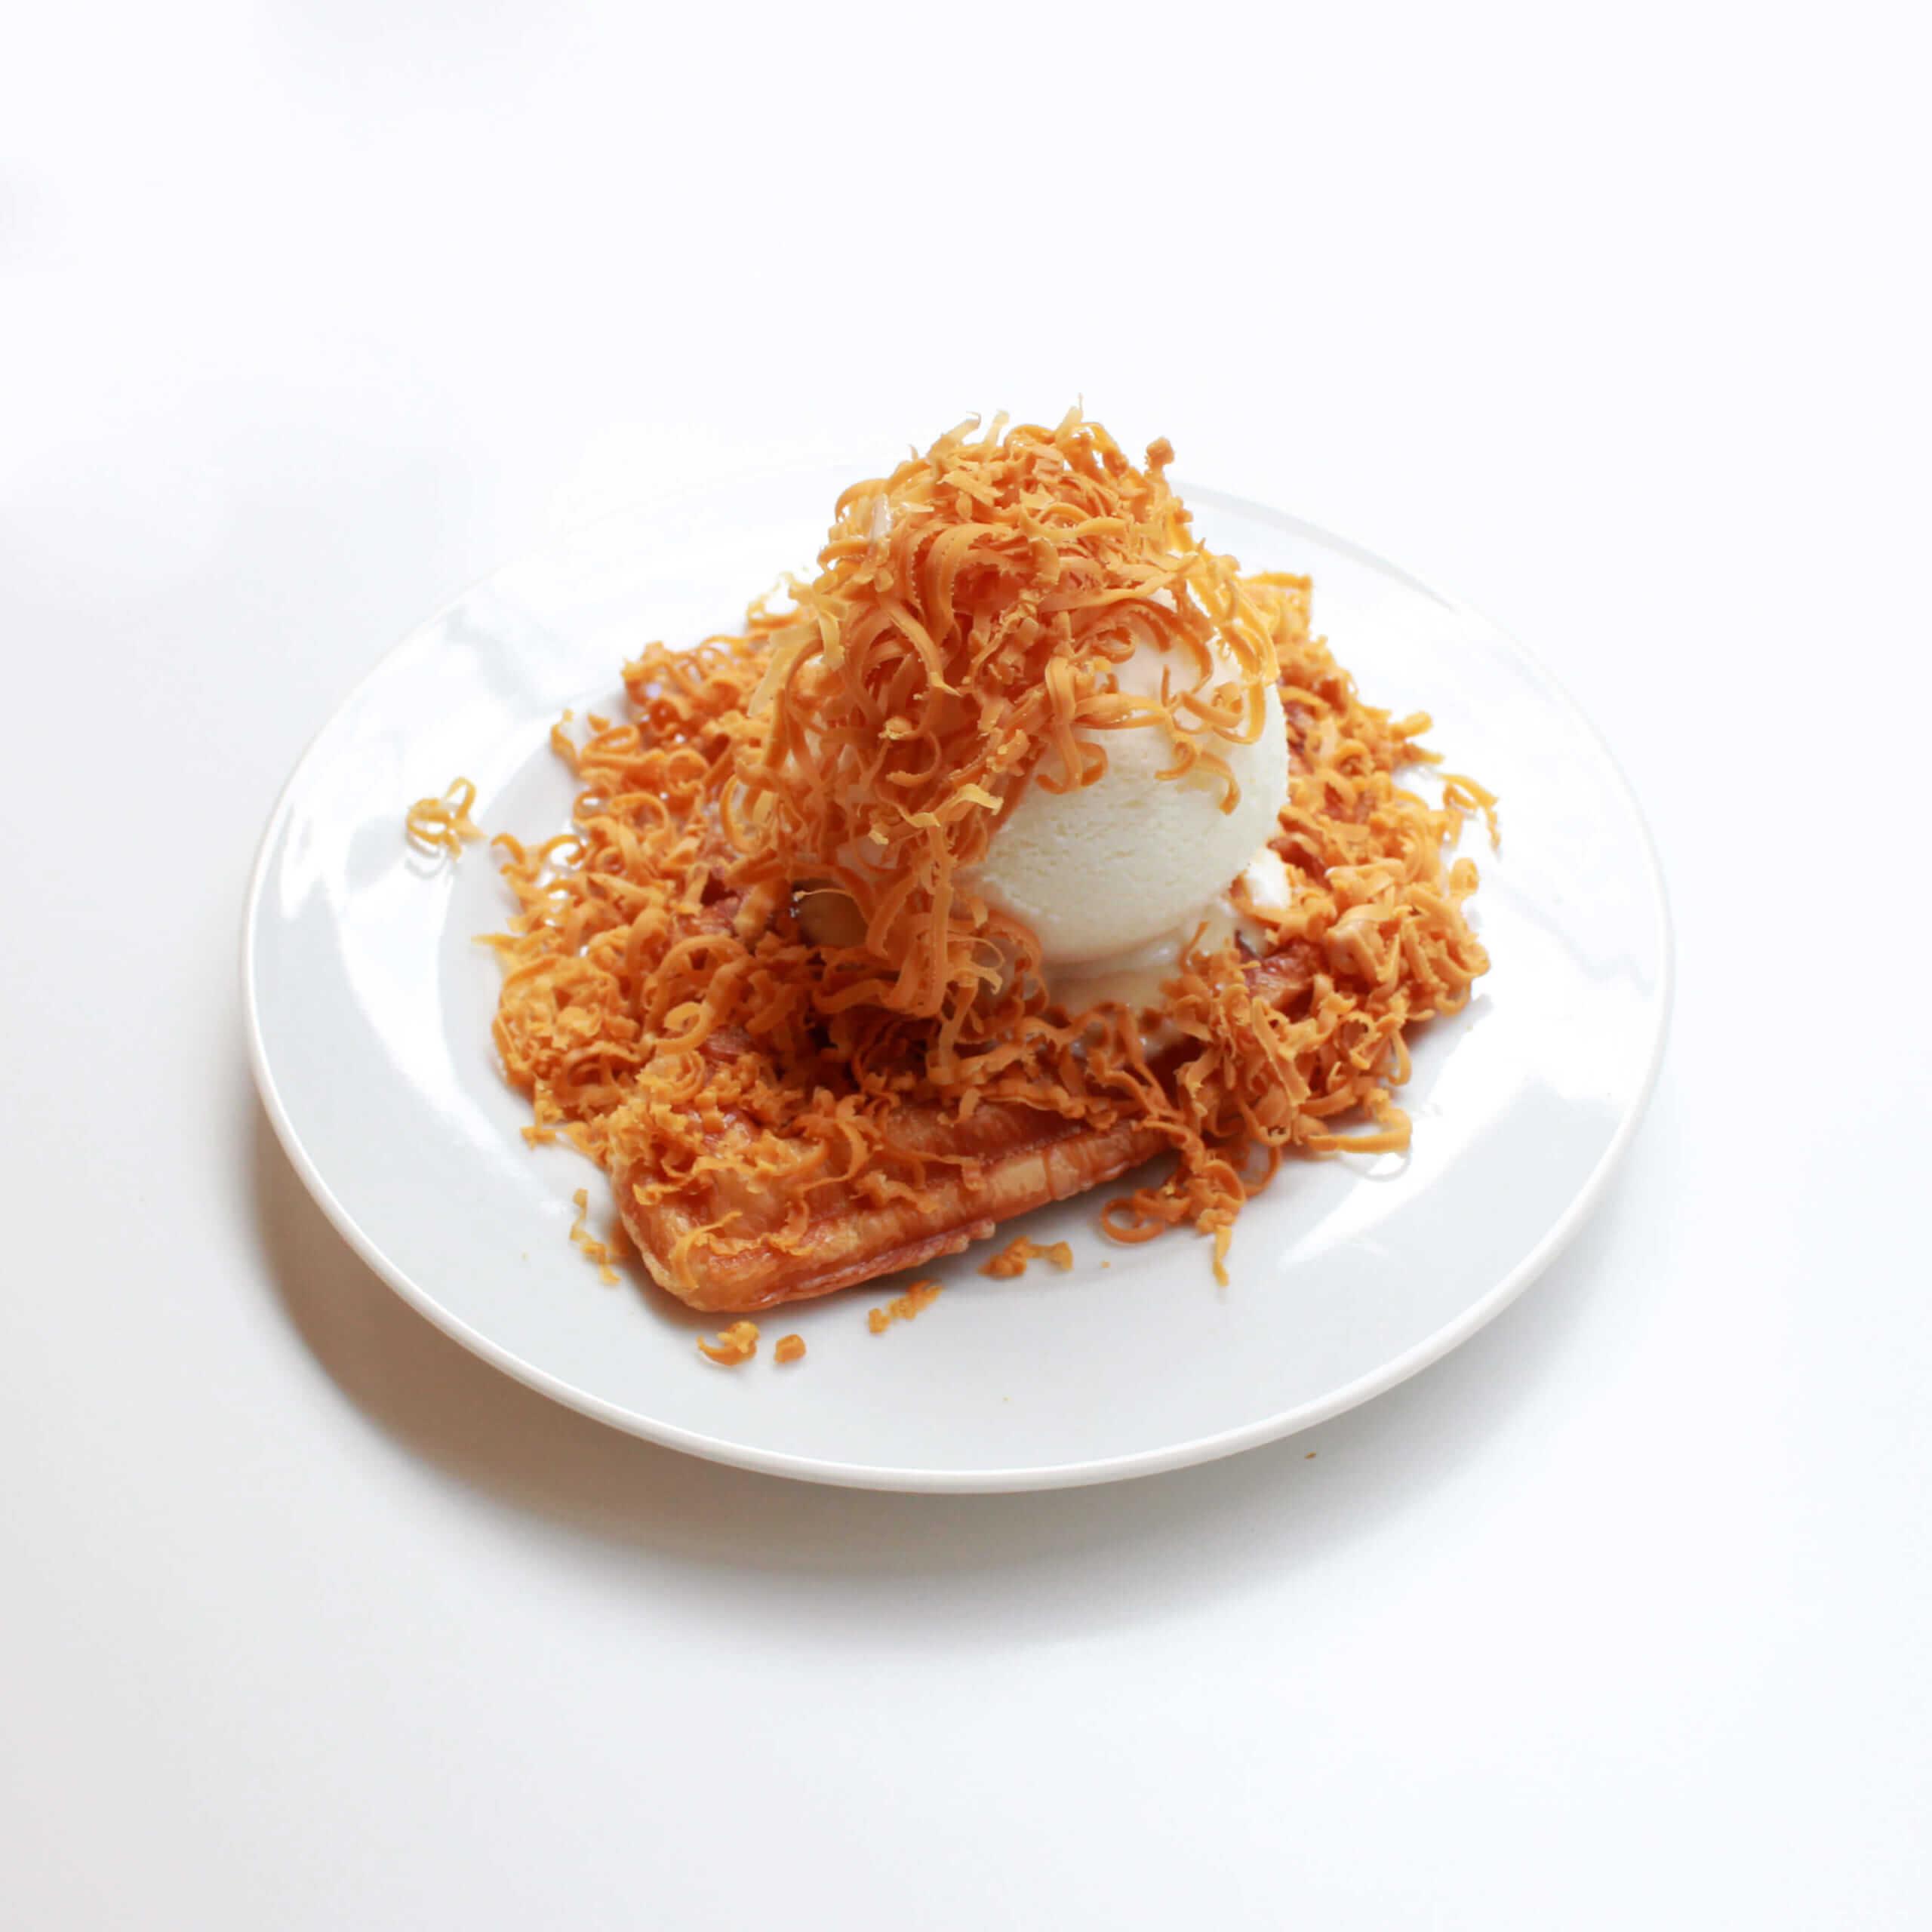 BIG BABY ICE CREAM(ビッグベイビーアイスクリーム)のチーズクロッフル/¥750円(税込)